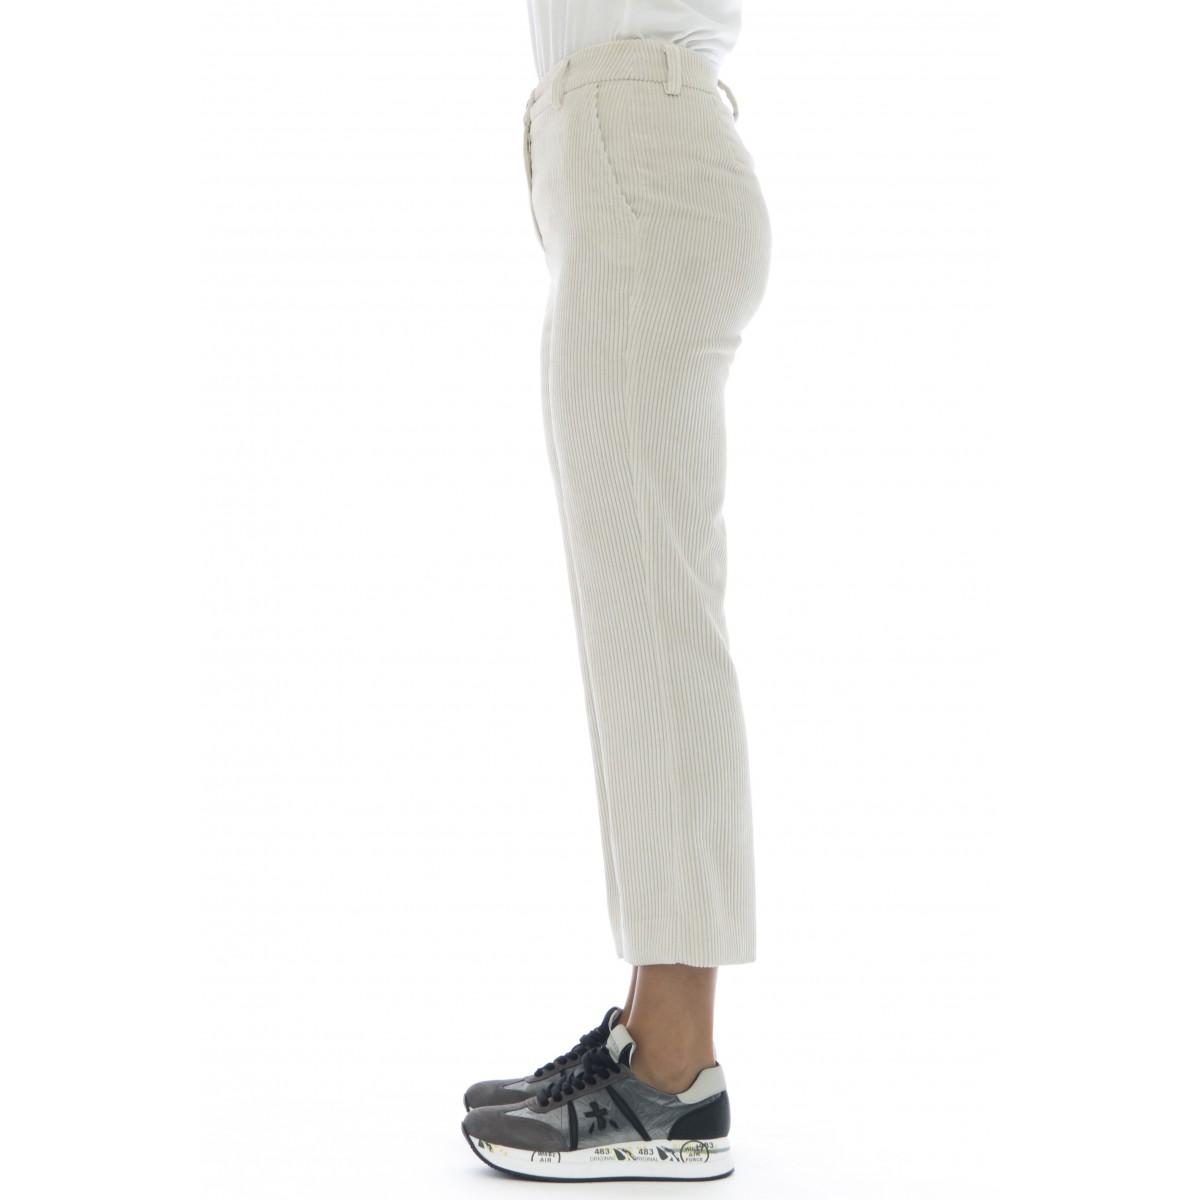 Pantalone donna - Mifey panta velluto